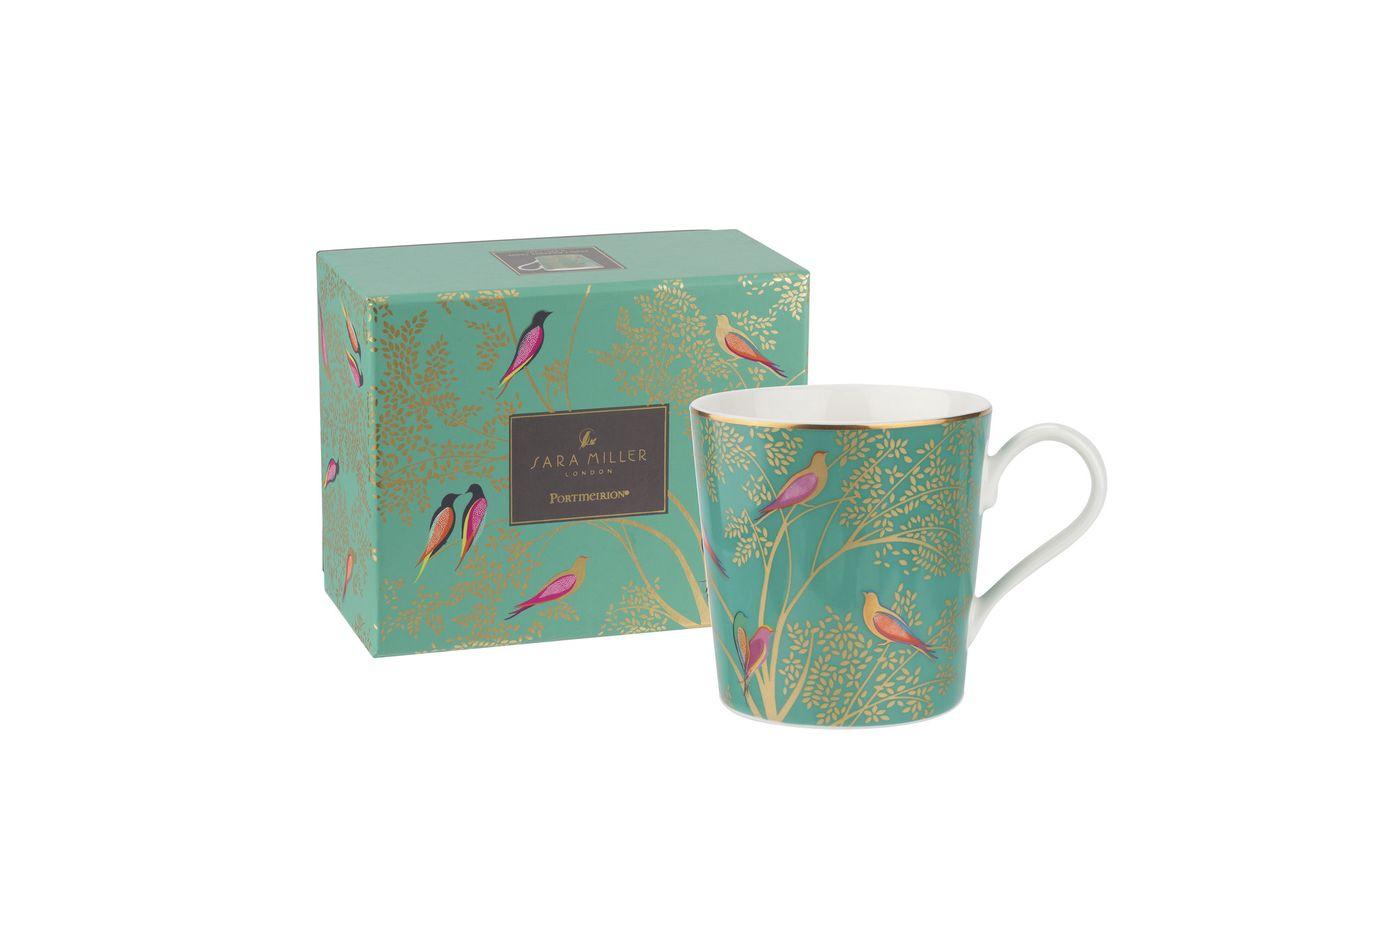 Sara Miller London for Portmeirion Chelsea Collection Mug Green 0.34l thumb 2